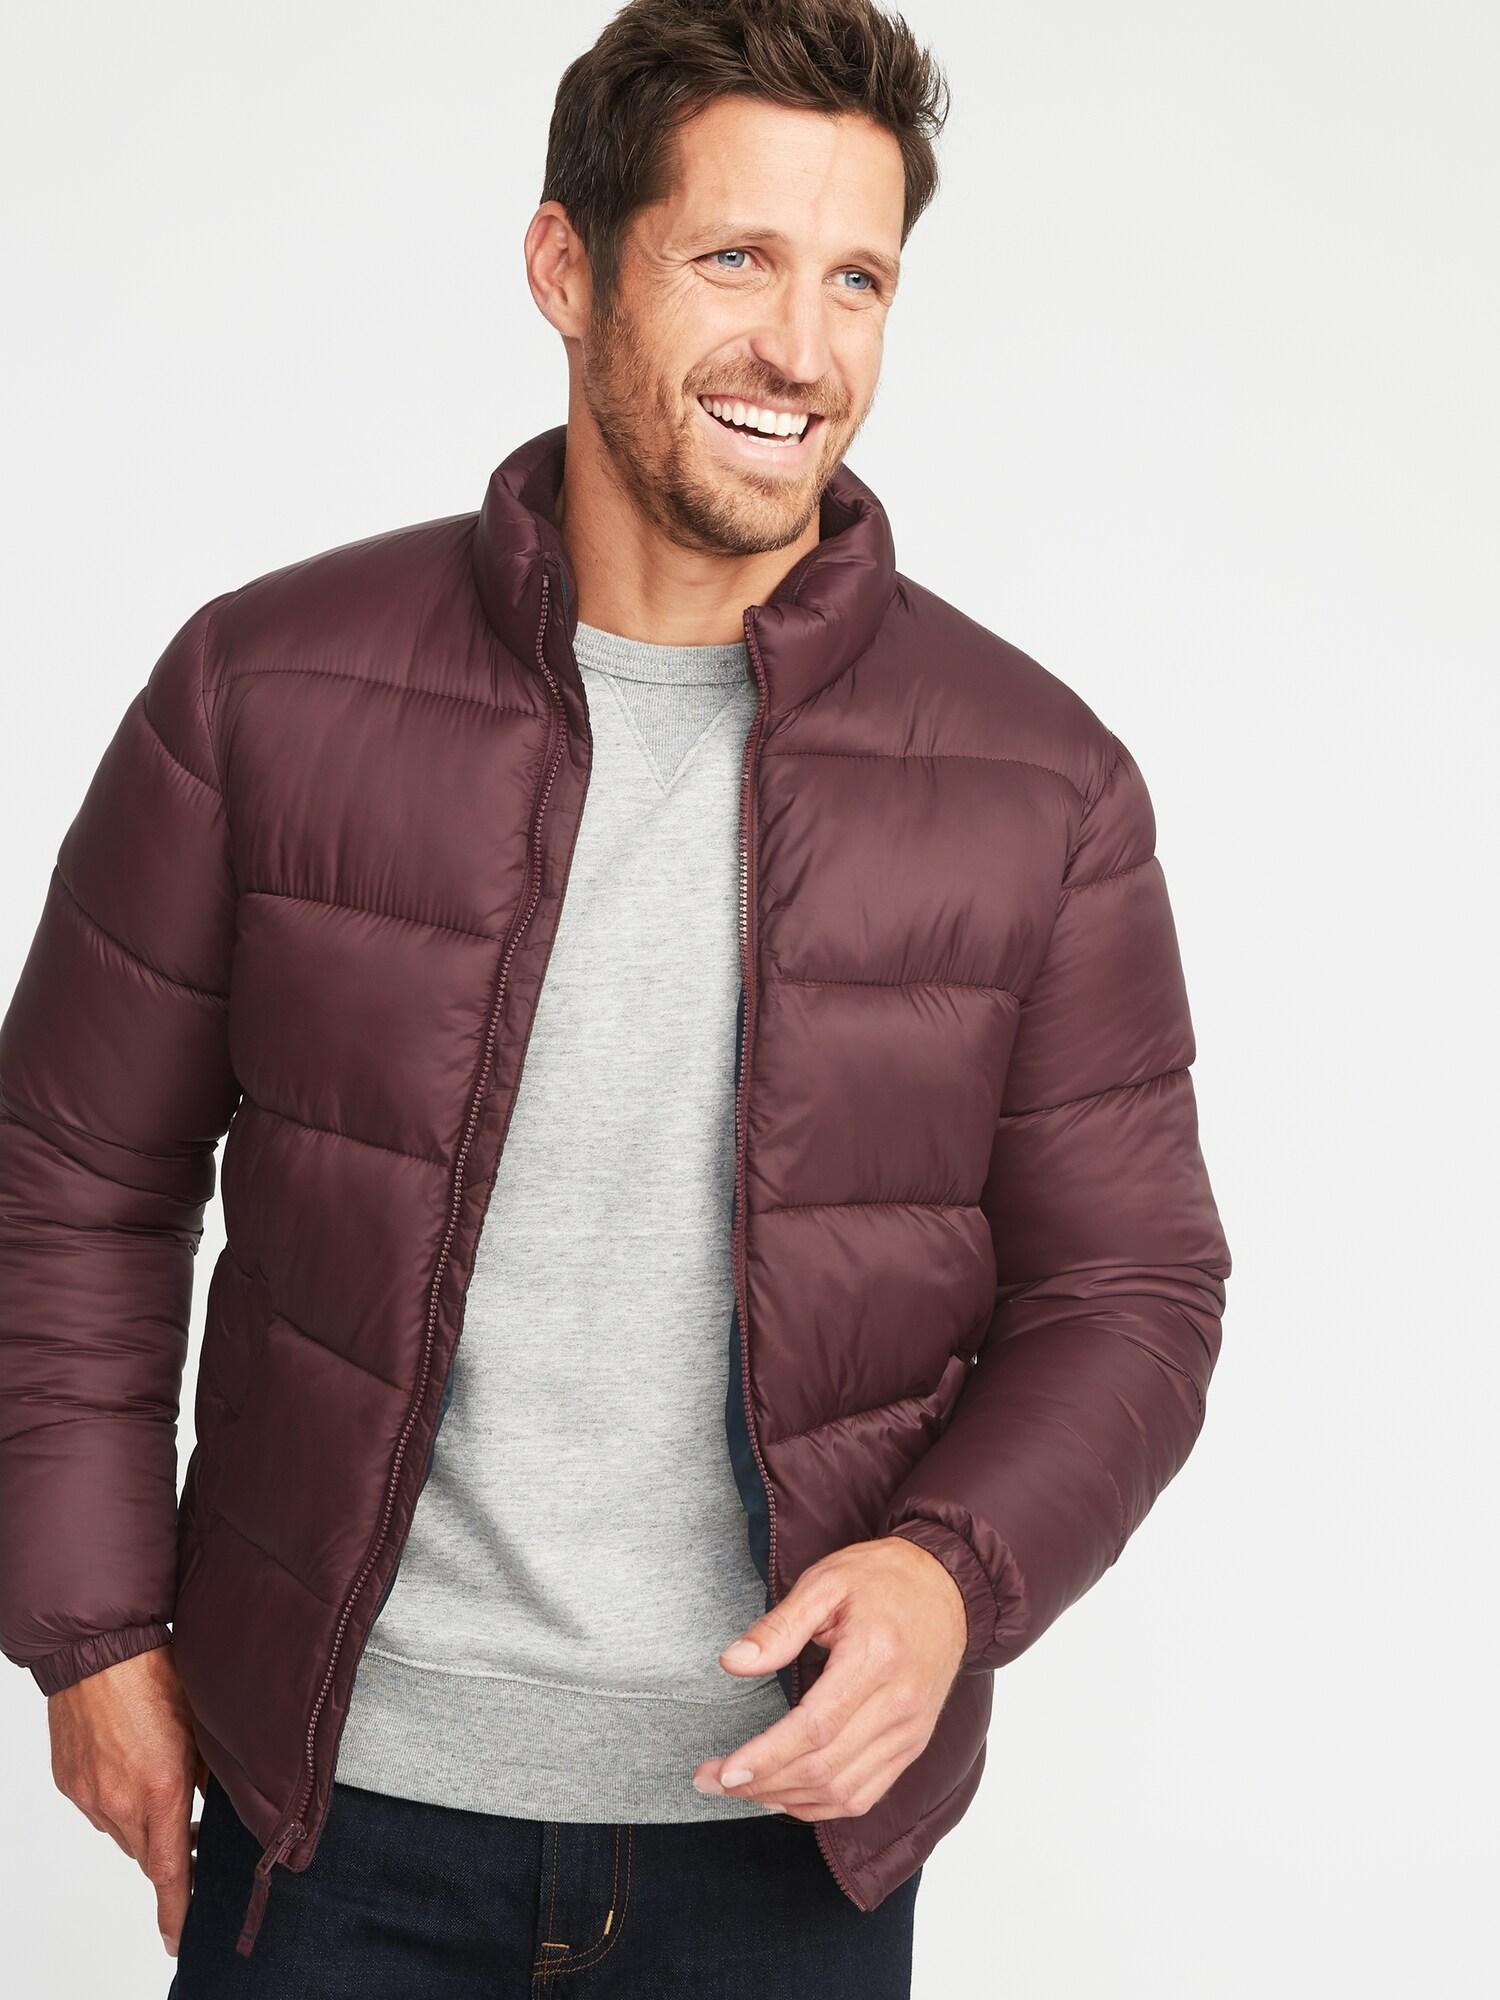 Nylon Frost Free Jacket For Men Old Navy Knit Hoodie Fingerless Maroon